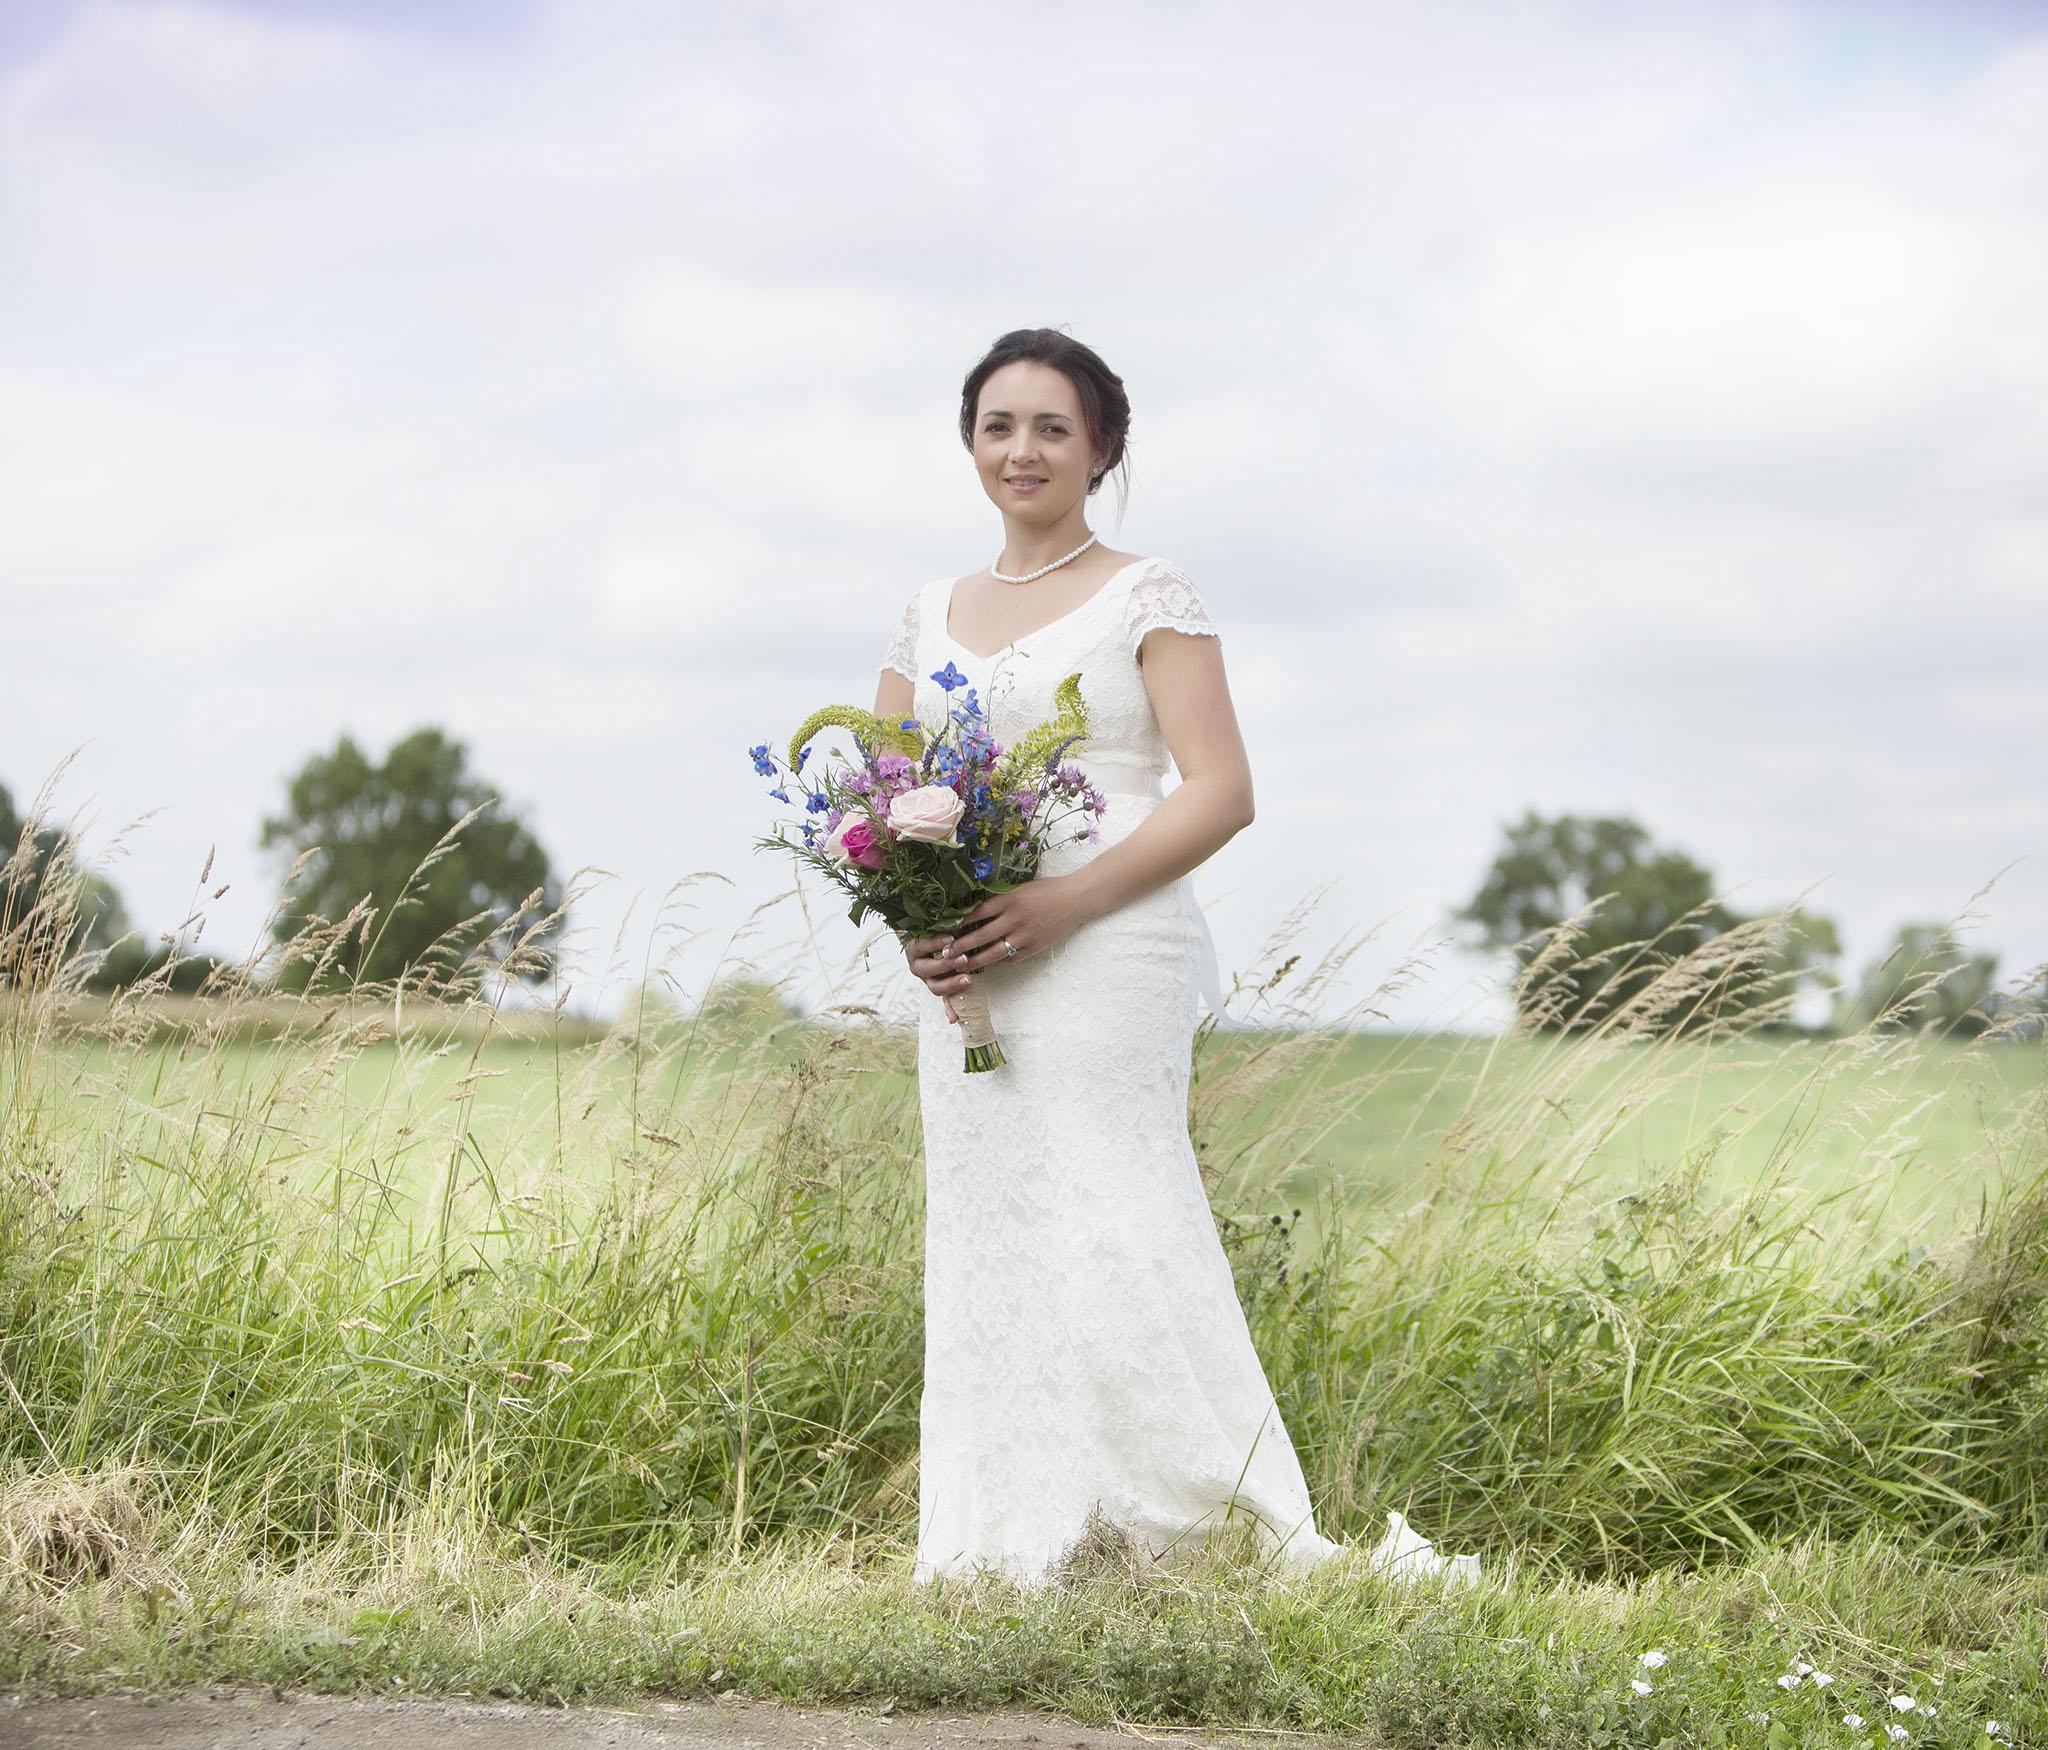 elizabethgphotography_kingslangley_hertfordshire_fineart_wedding_photography_lincolnshire_anna_simon_04.jpg